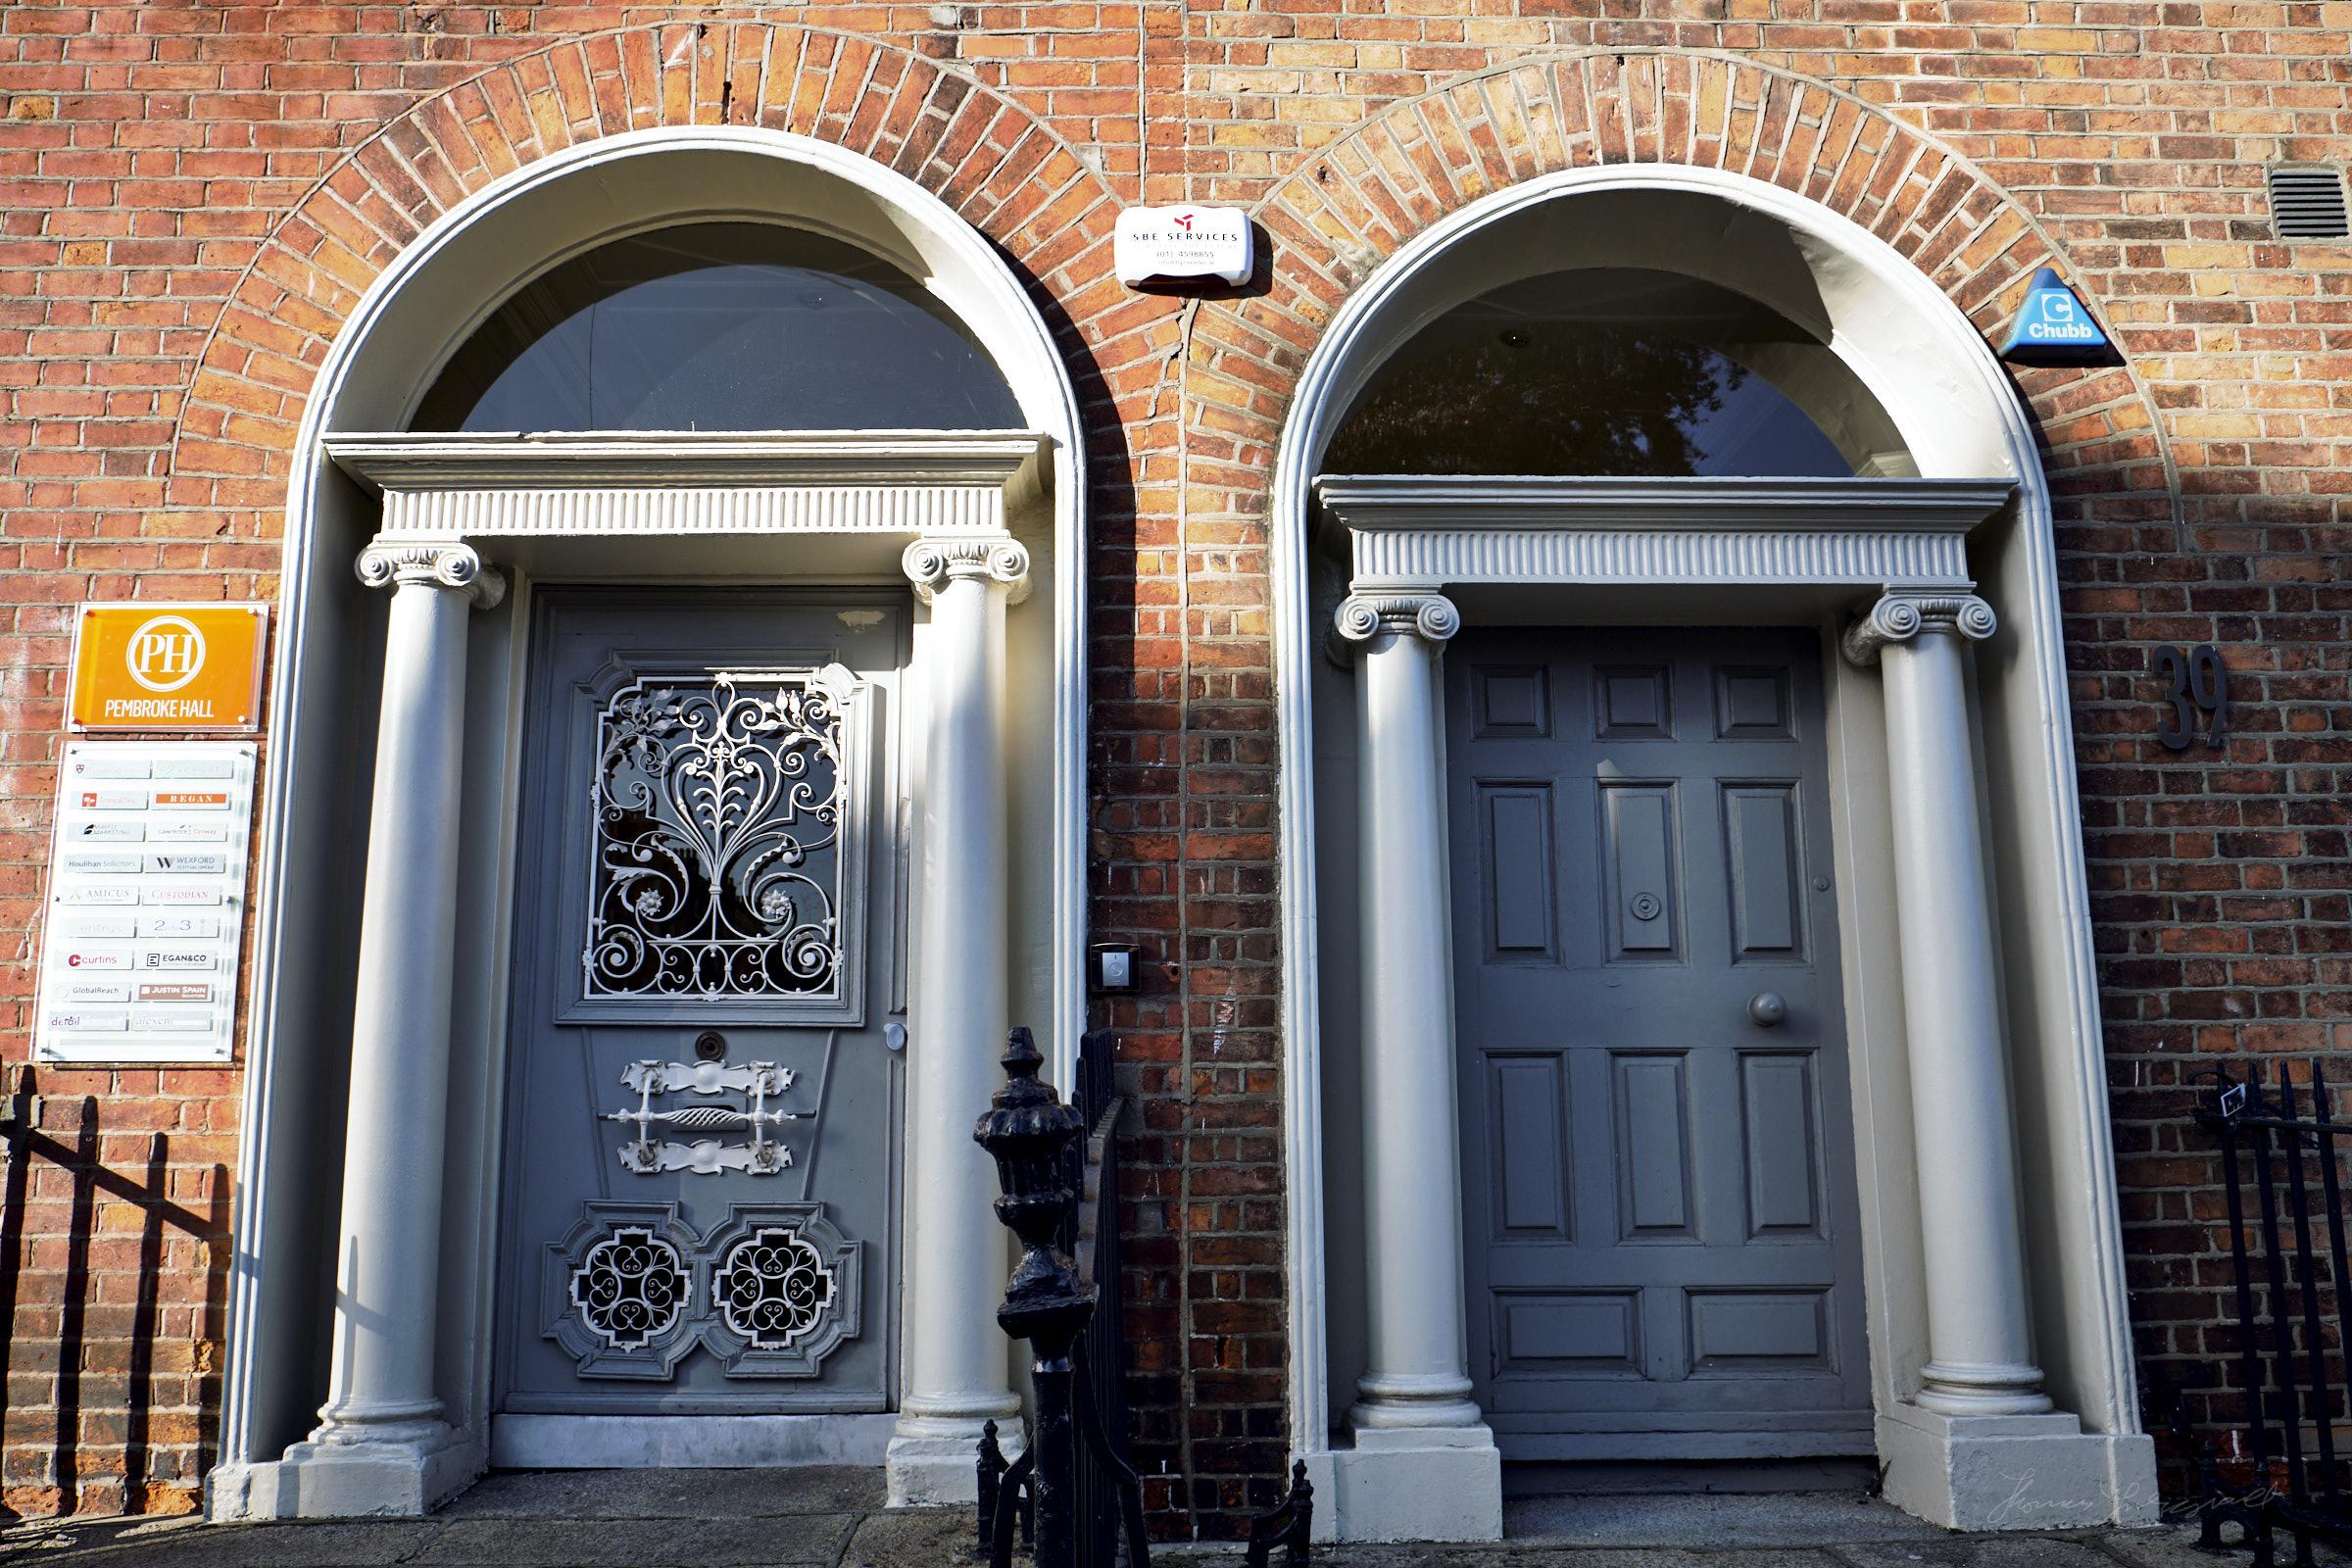 Ornate Doorways in Dublin